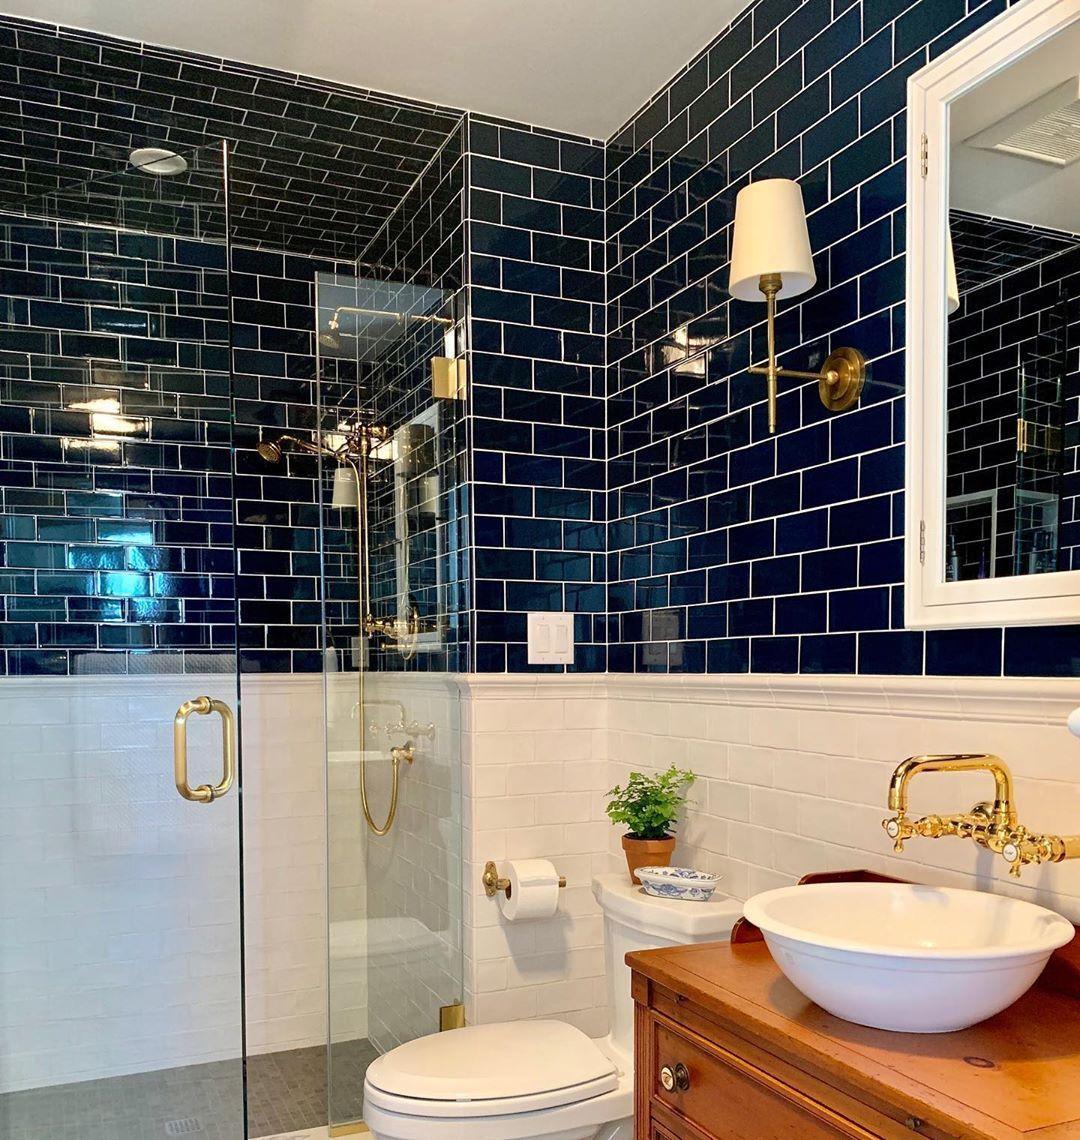 bathrooms Mexico bathrooms Sink KATIE ROSENFELD  COMPANY on I